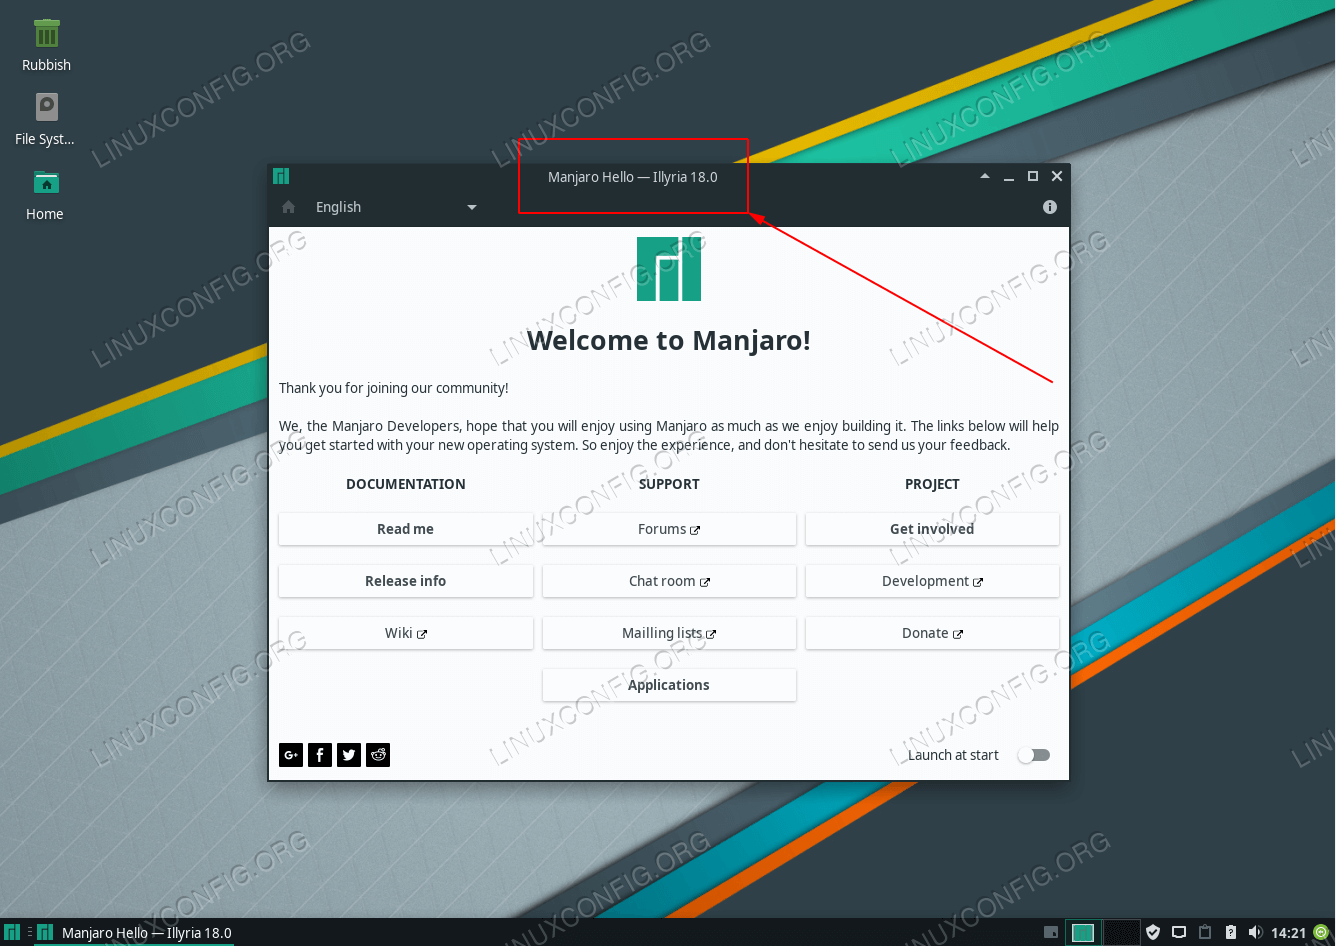 Locate Manjaro Linux version on the Manjaro Hello window title bar